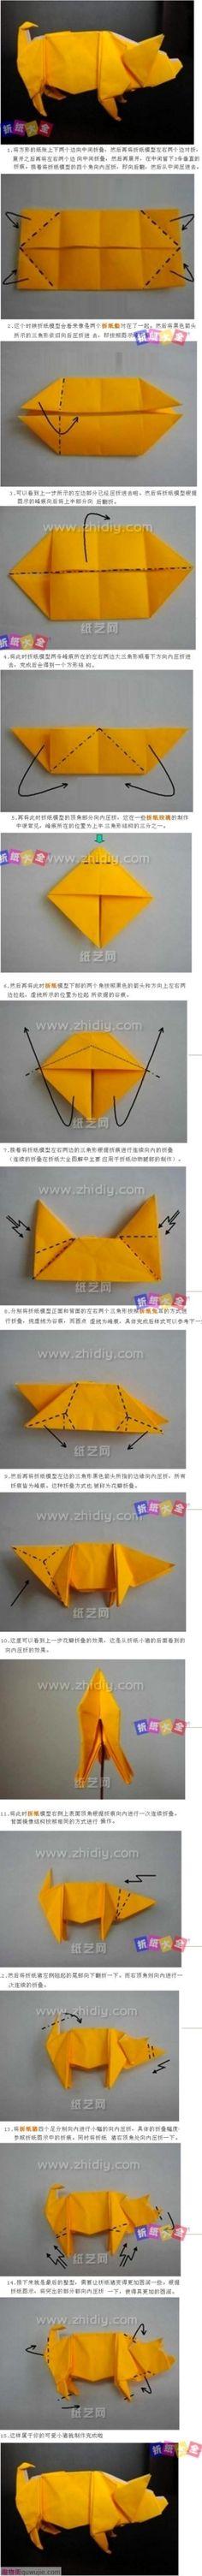 Origami Pig Origami Pig by diyforever